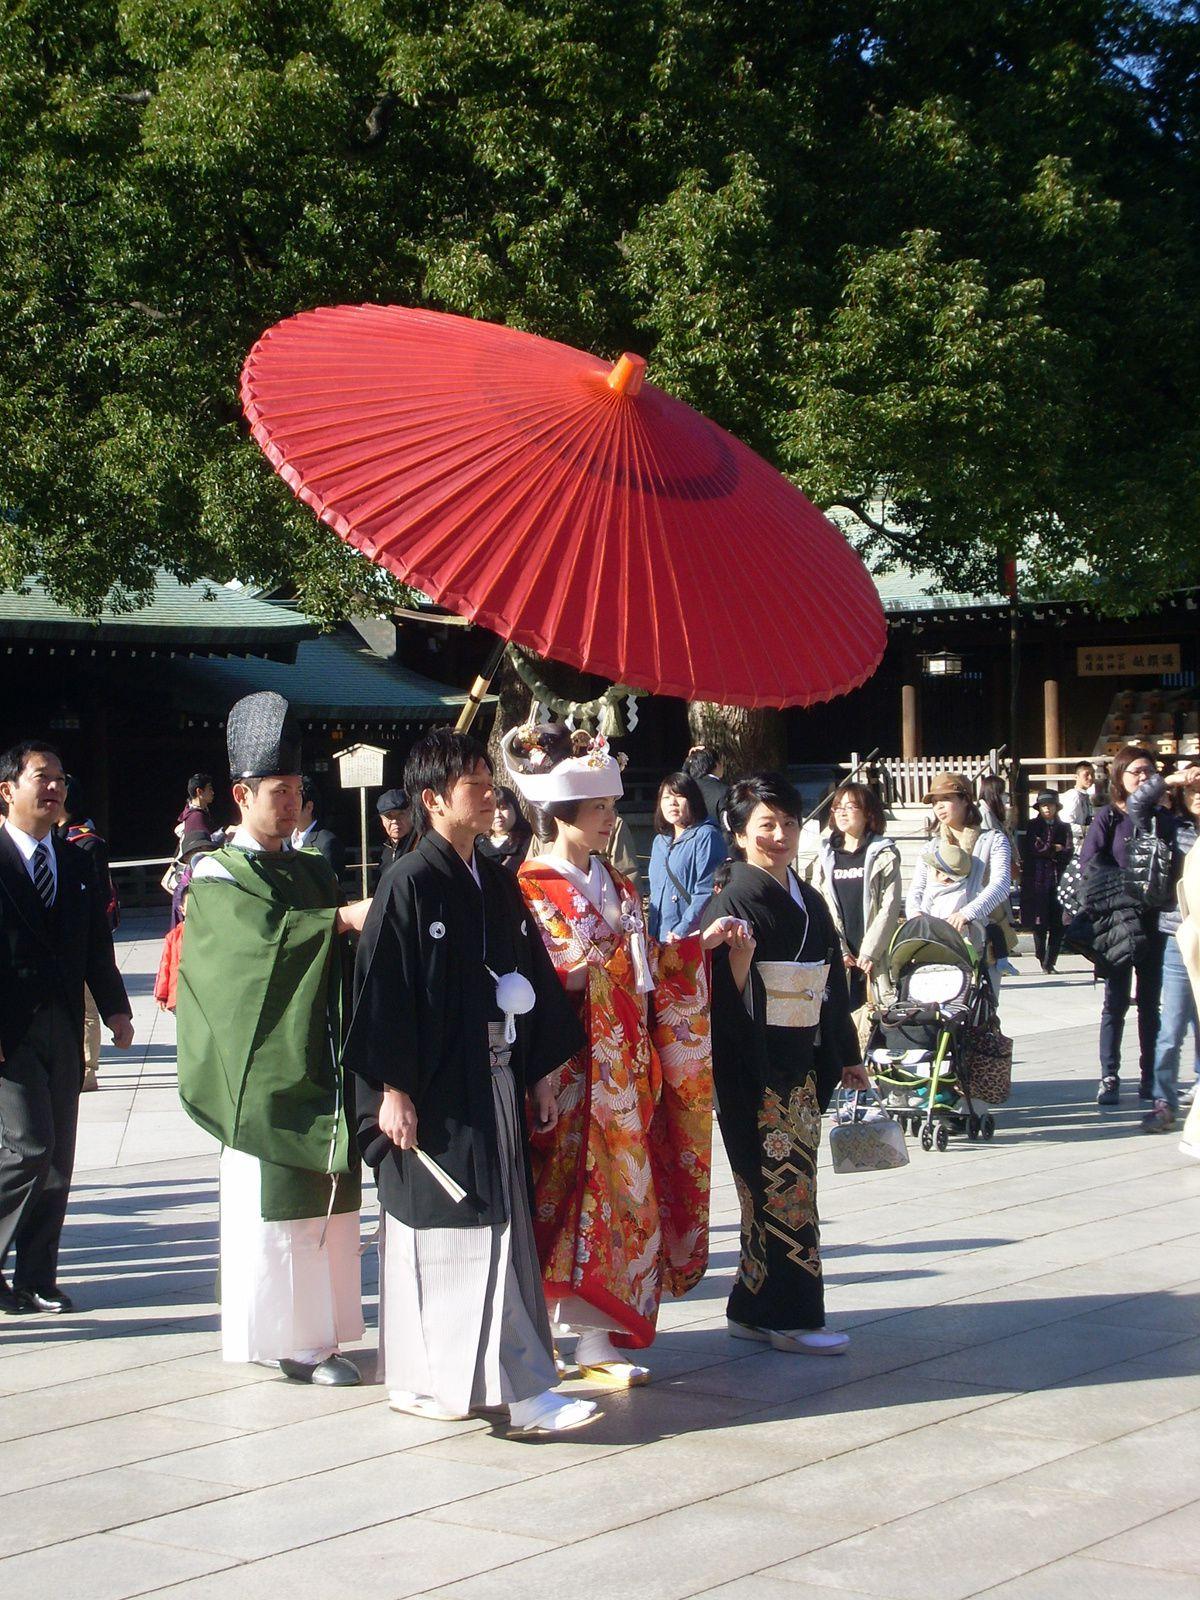 Mariage shinto au Parc Yoyogi - Tokyo Novembre 2013